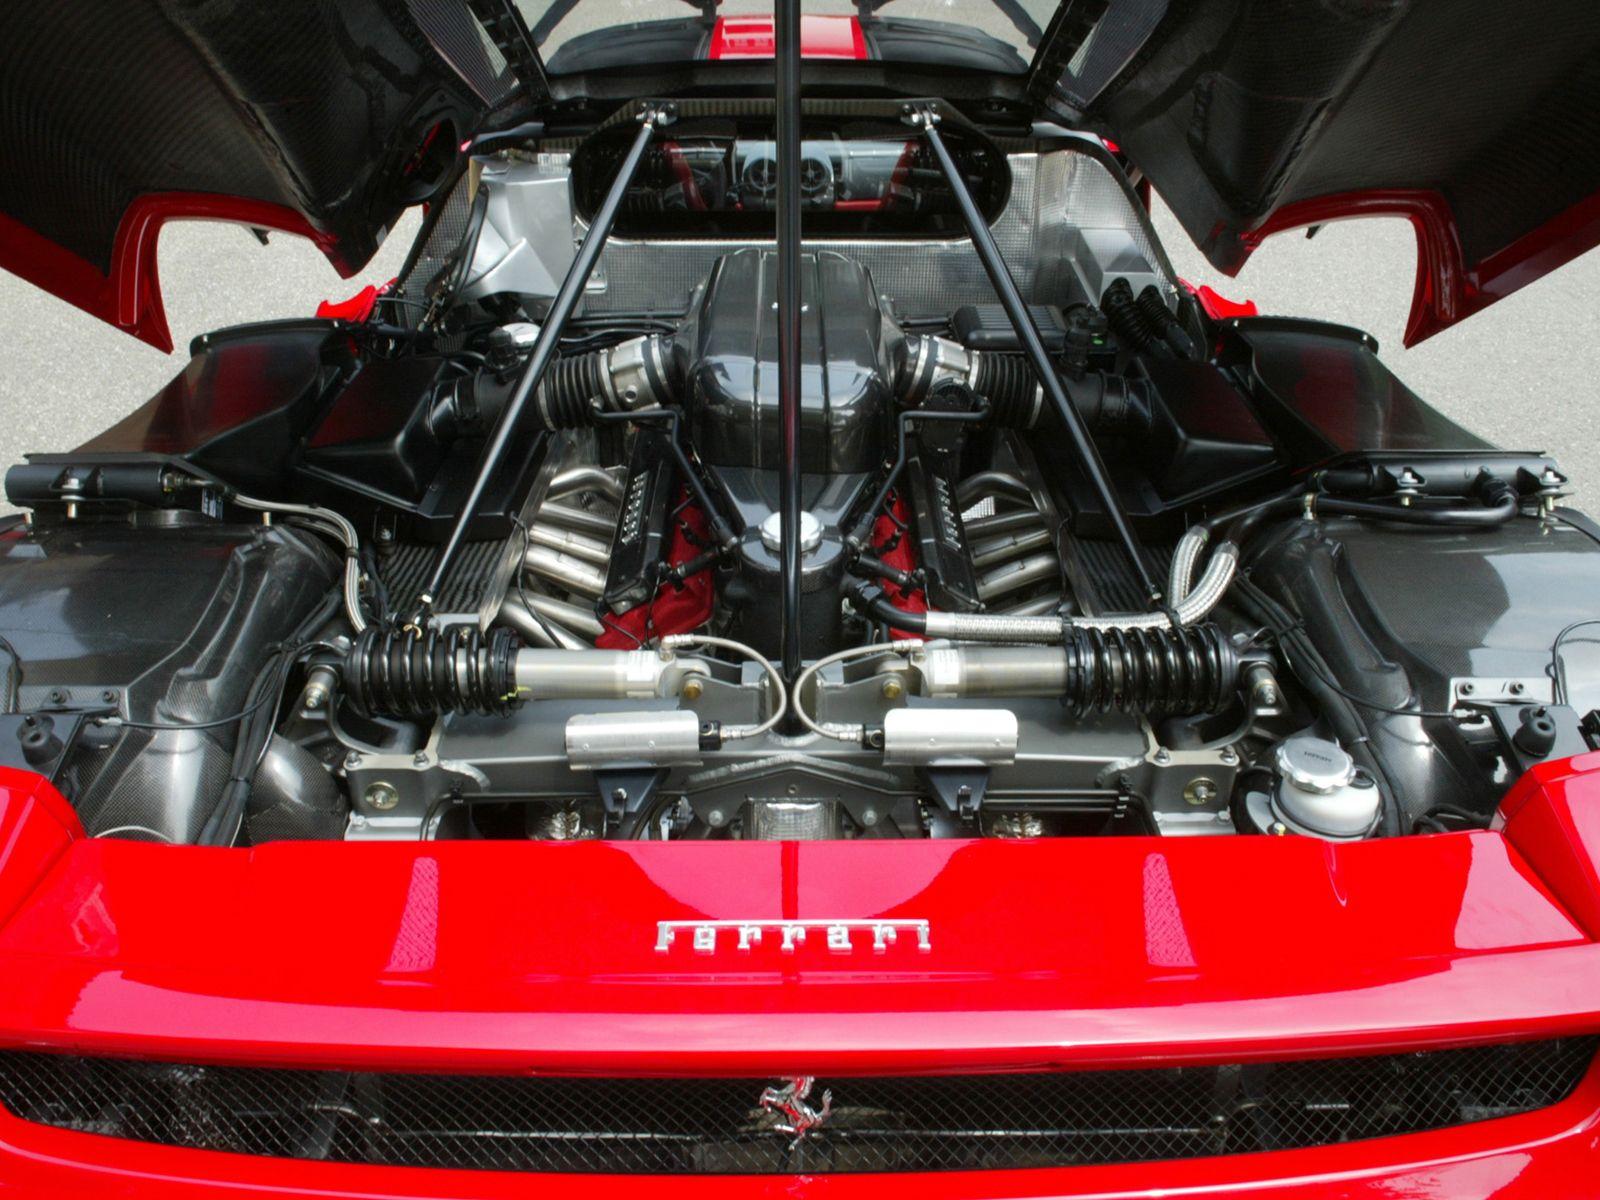 Wallpaper : Sports Car, Ferrari F40, Performance Car, Netcarshow, Netcar,  Car Images, Car Photo, 2011, Enzo, Supercar, Land Vehicle, Automotive  Design, ...